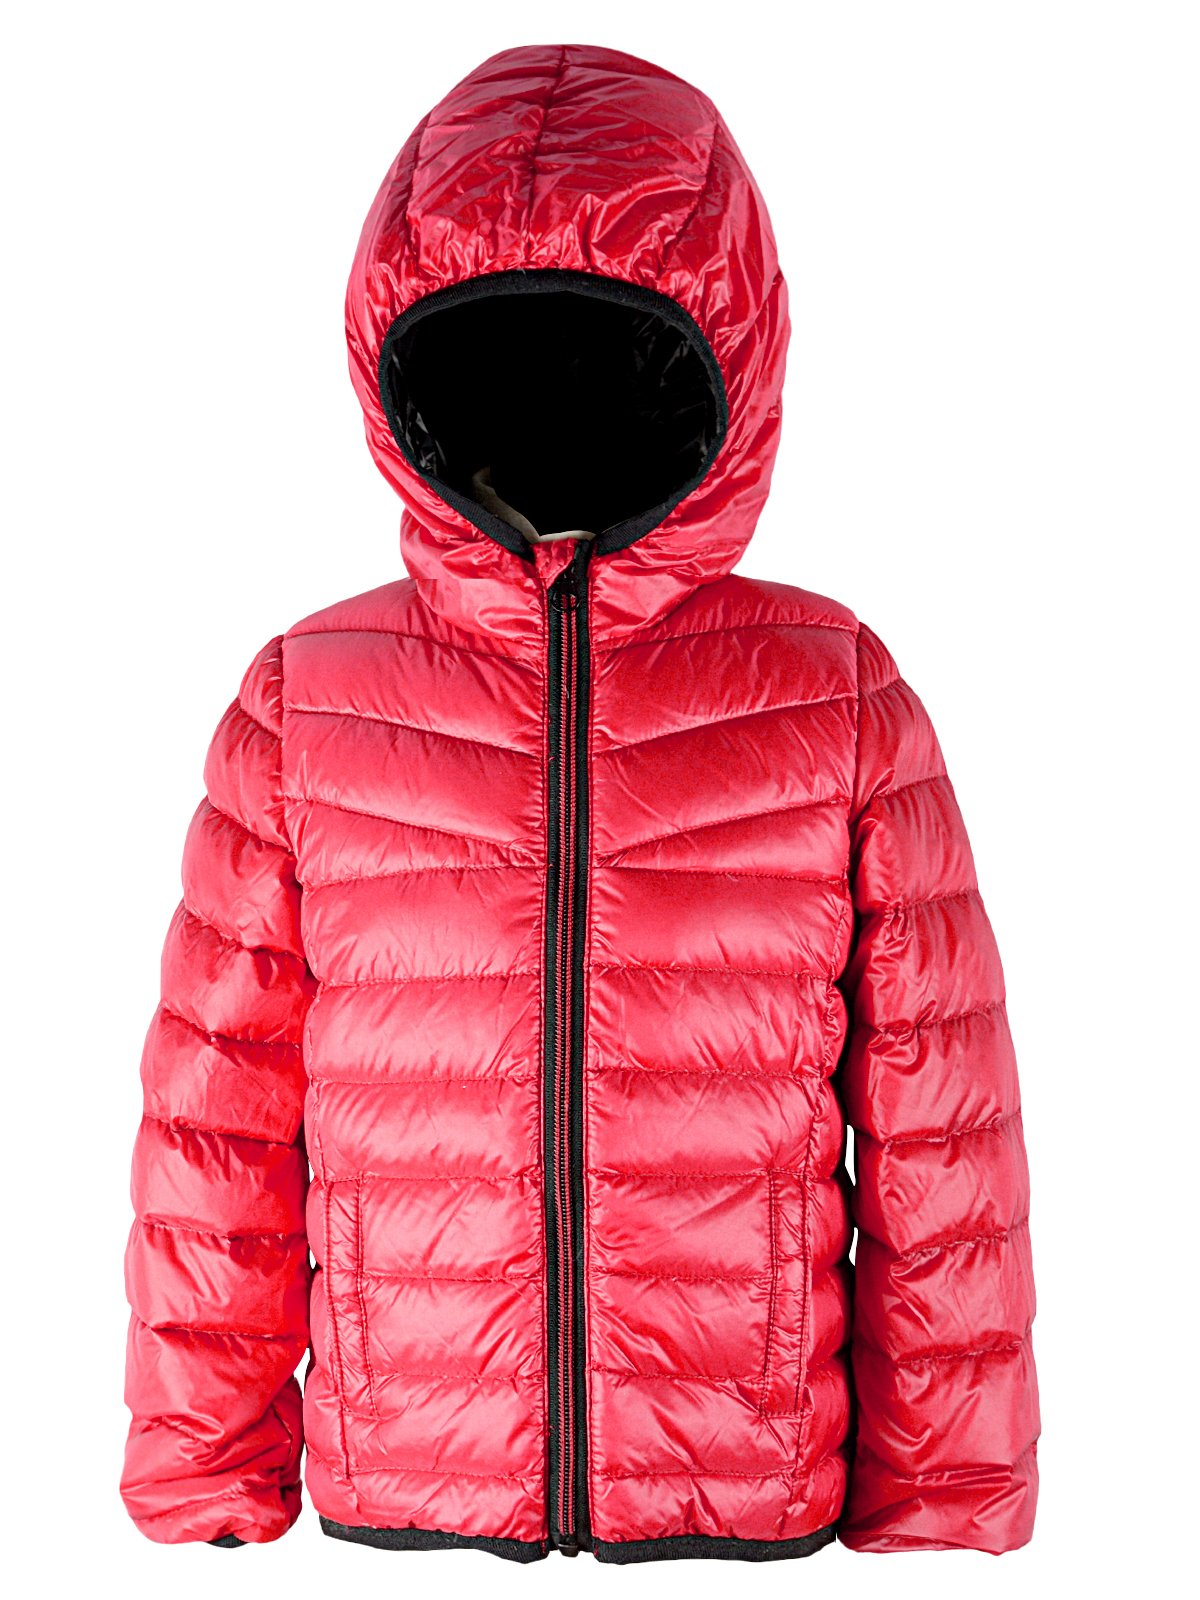 eff5a96feee54 American Trends Kids Warm Down Jackets For Girls Boys Puffer Winter Coat Lightweight  Packable Hooded Parka Zipper Outerwear Red 2-3T Label 110